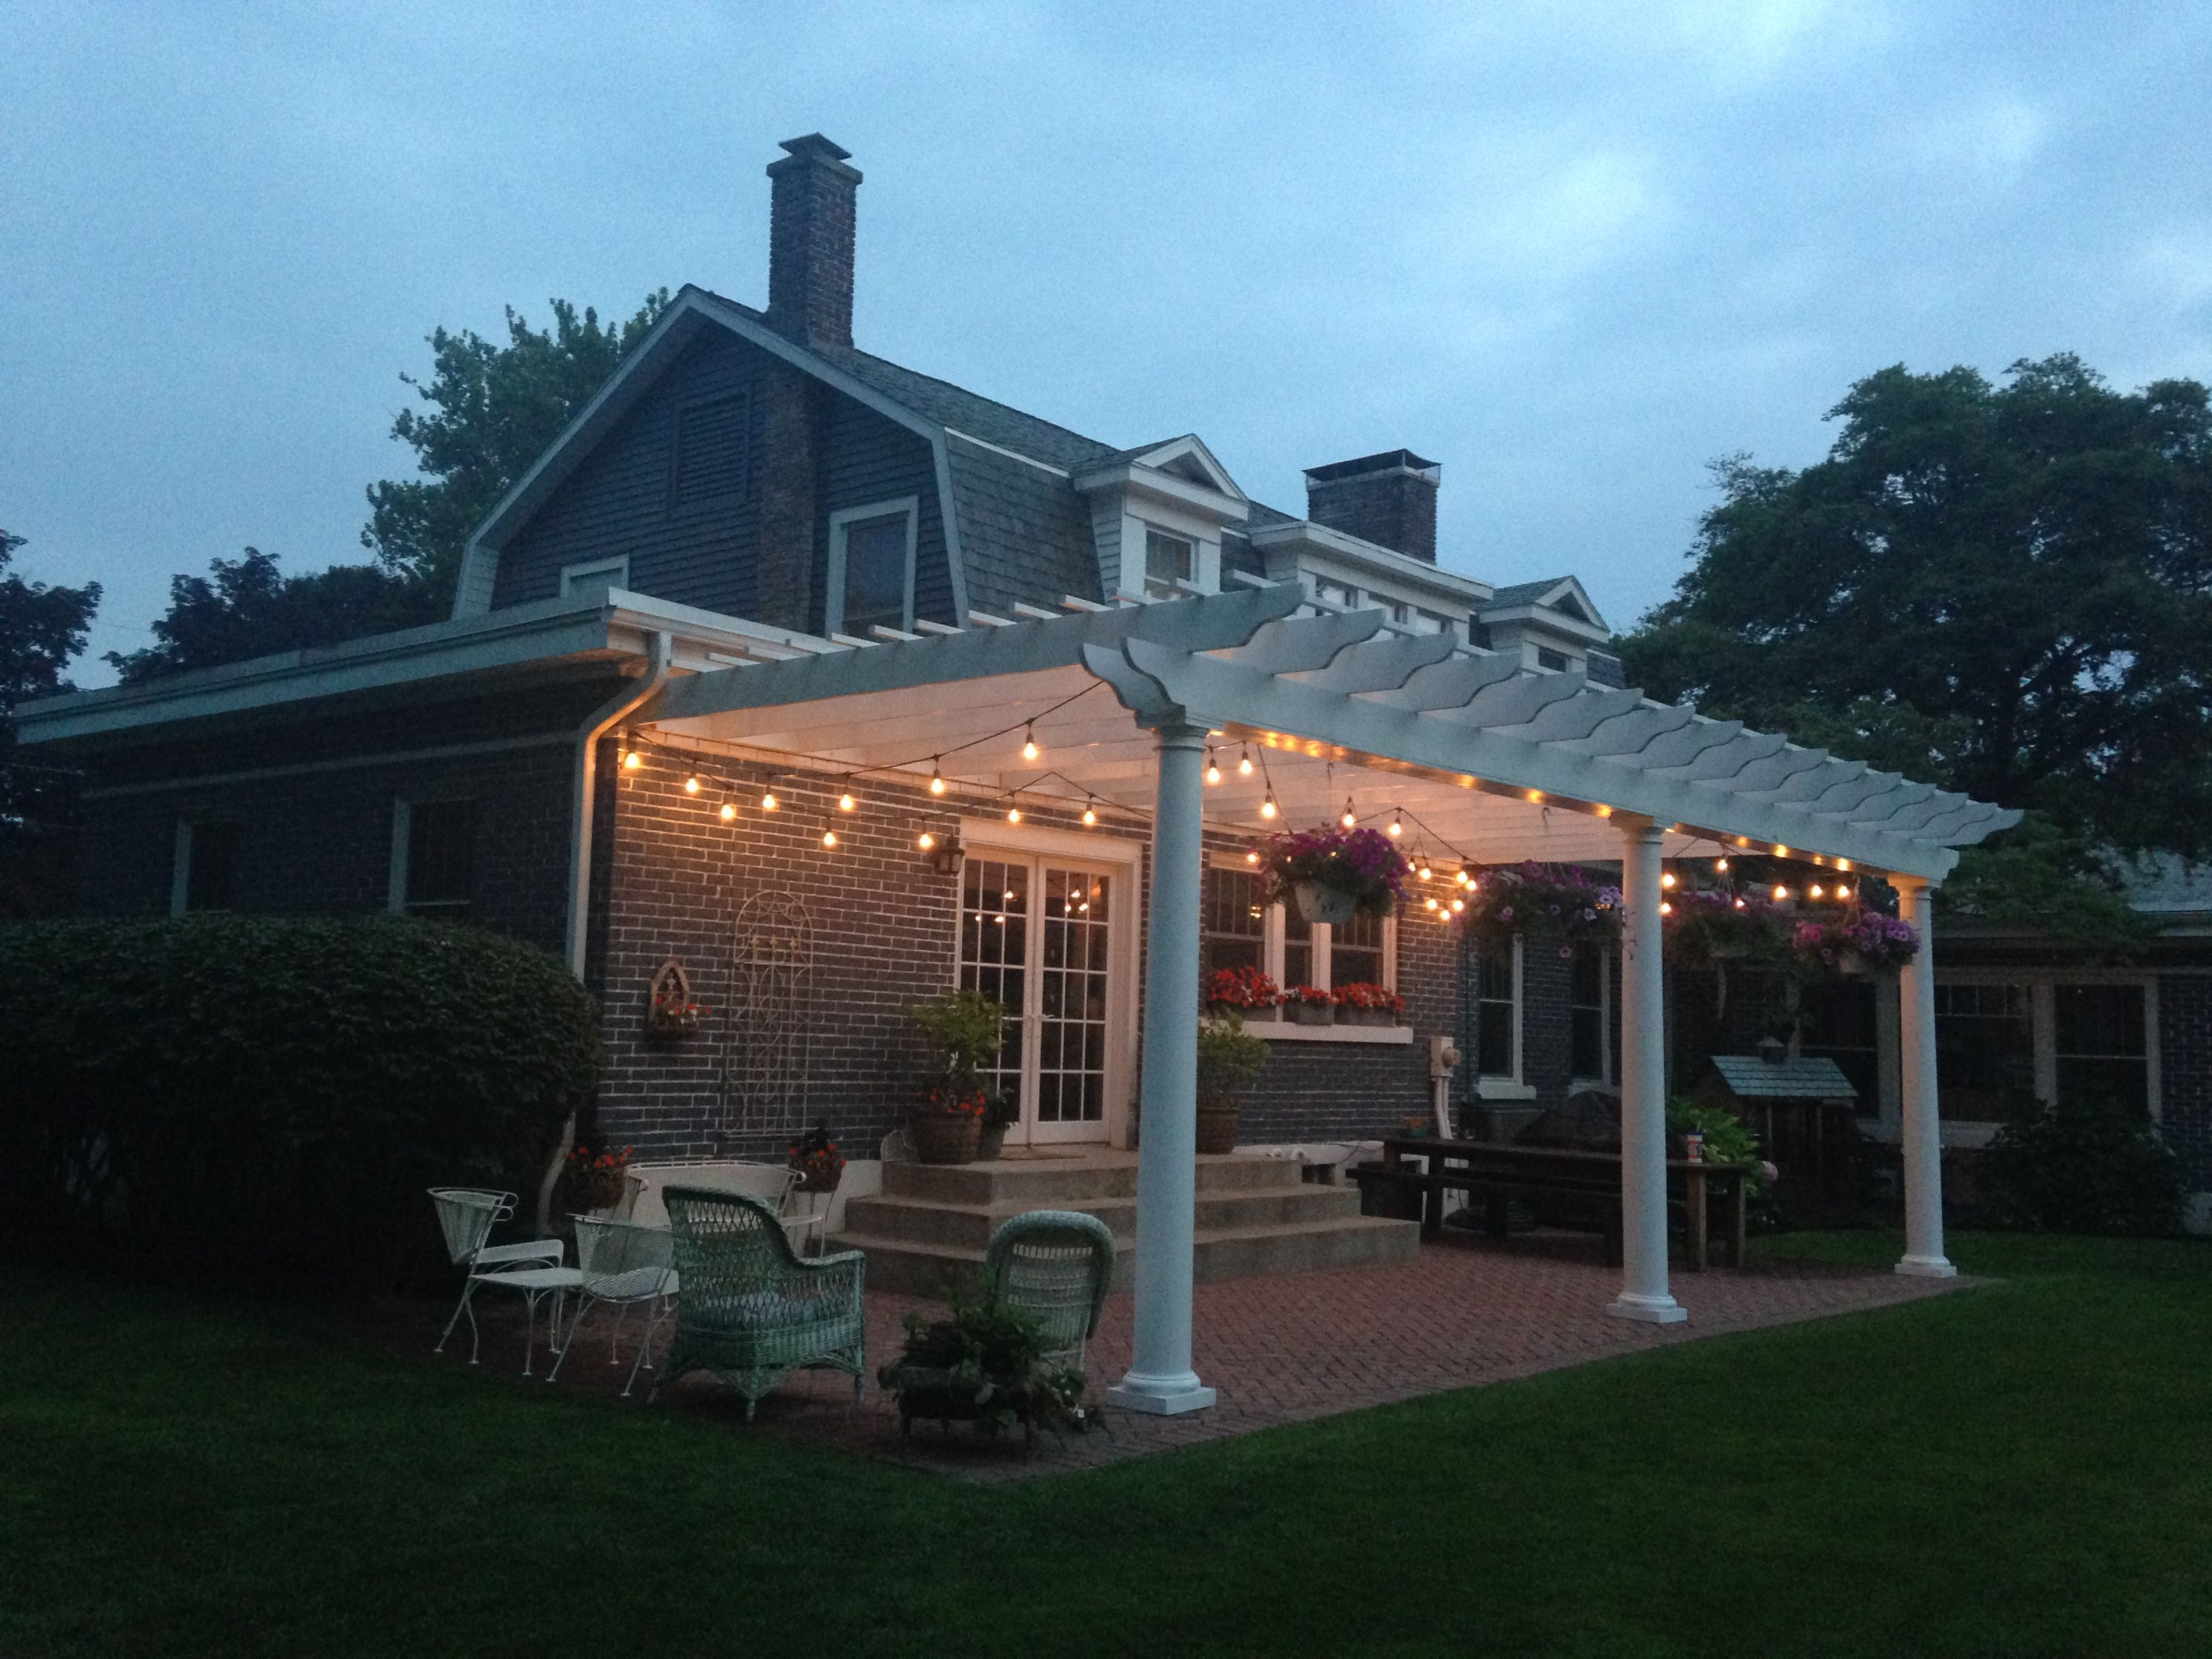 Patio Cafe Lights Home Design Ideas and